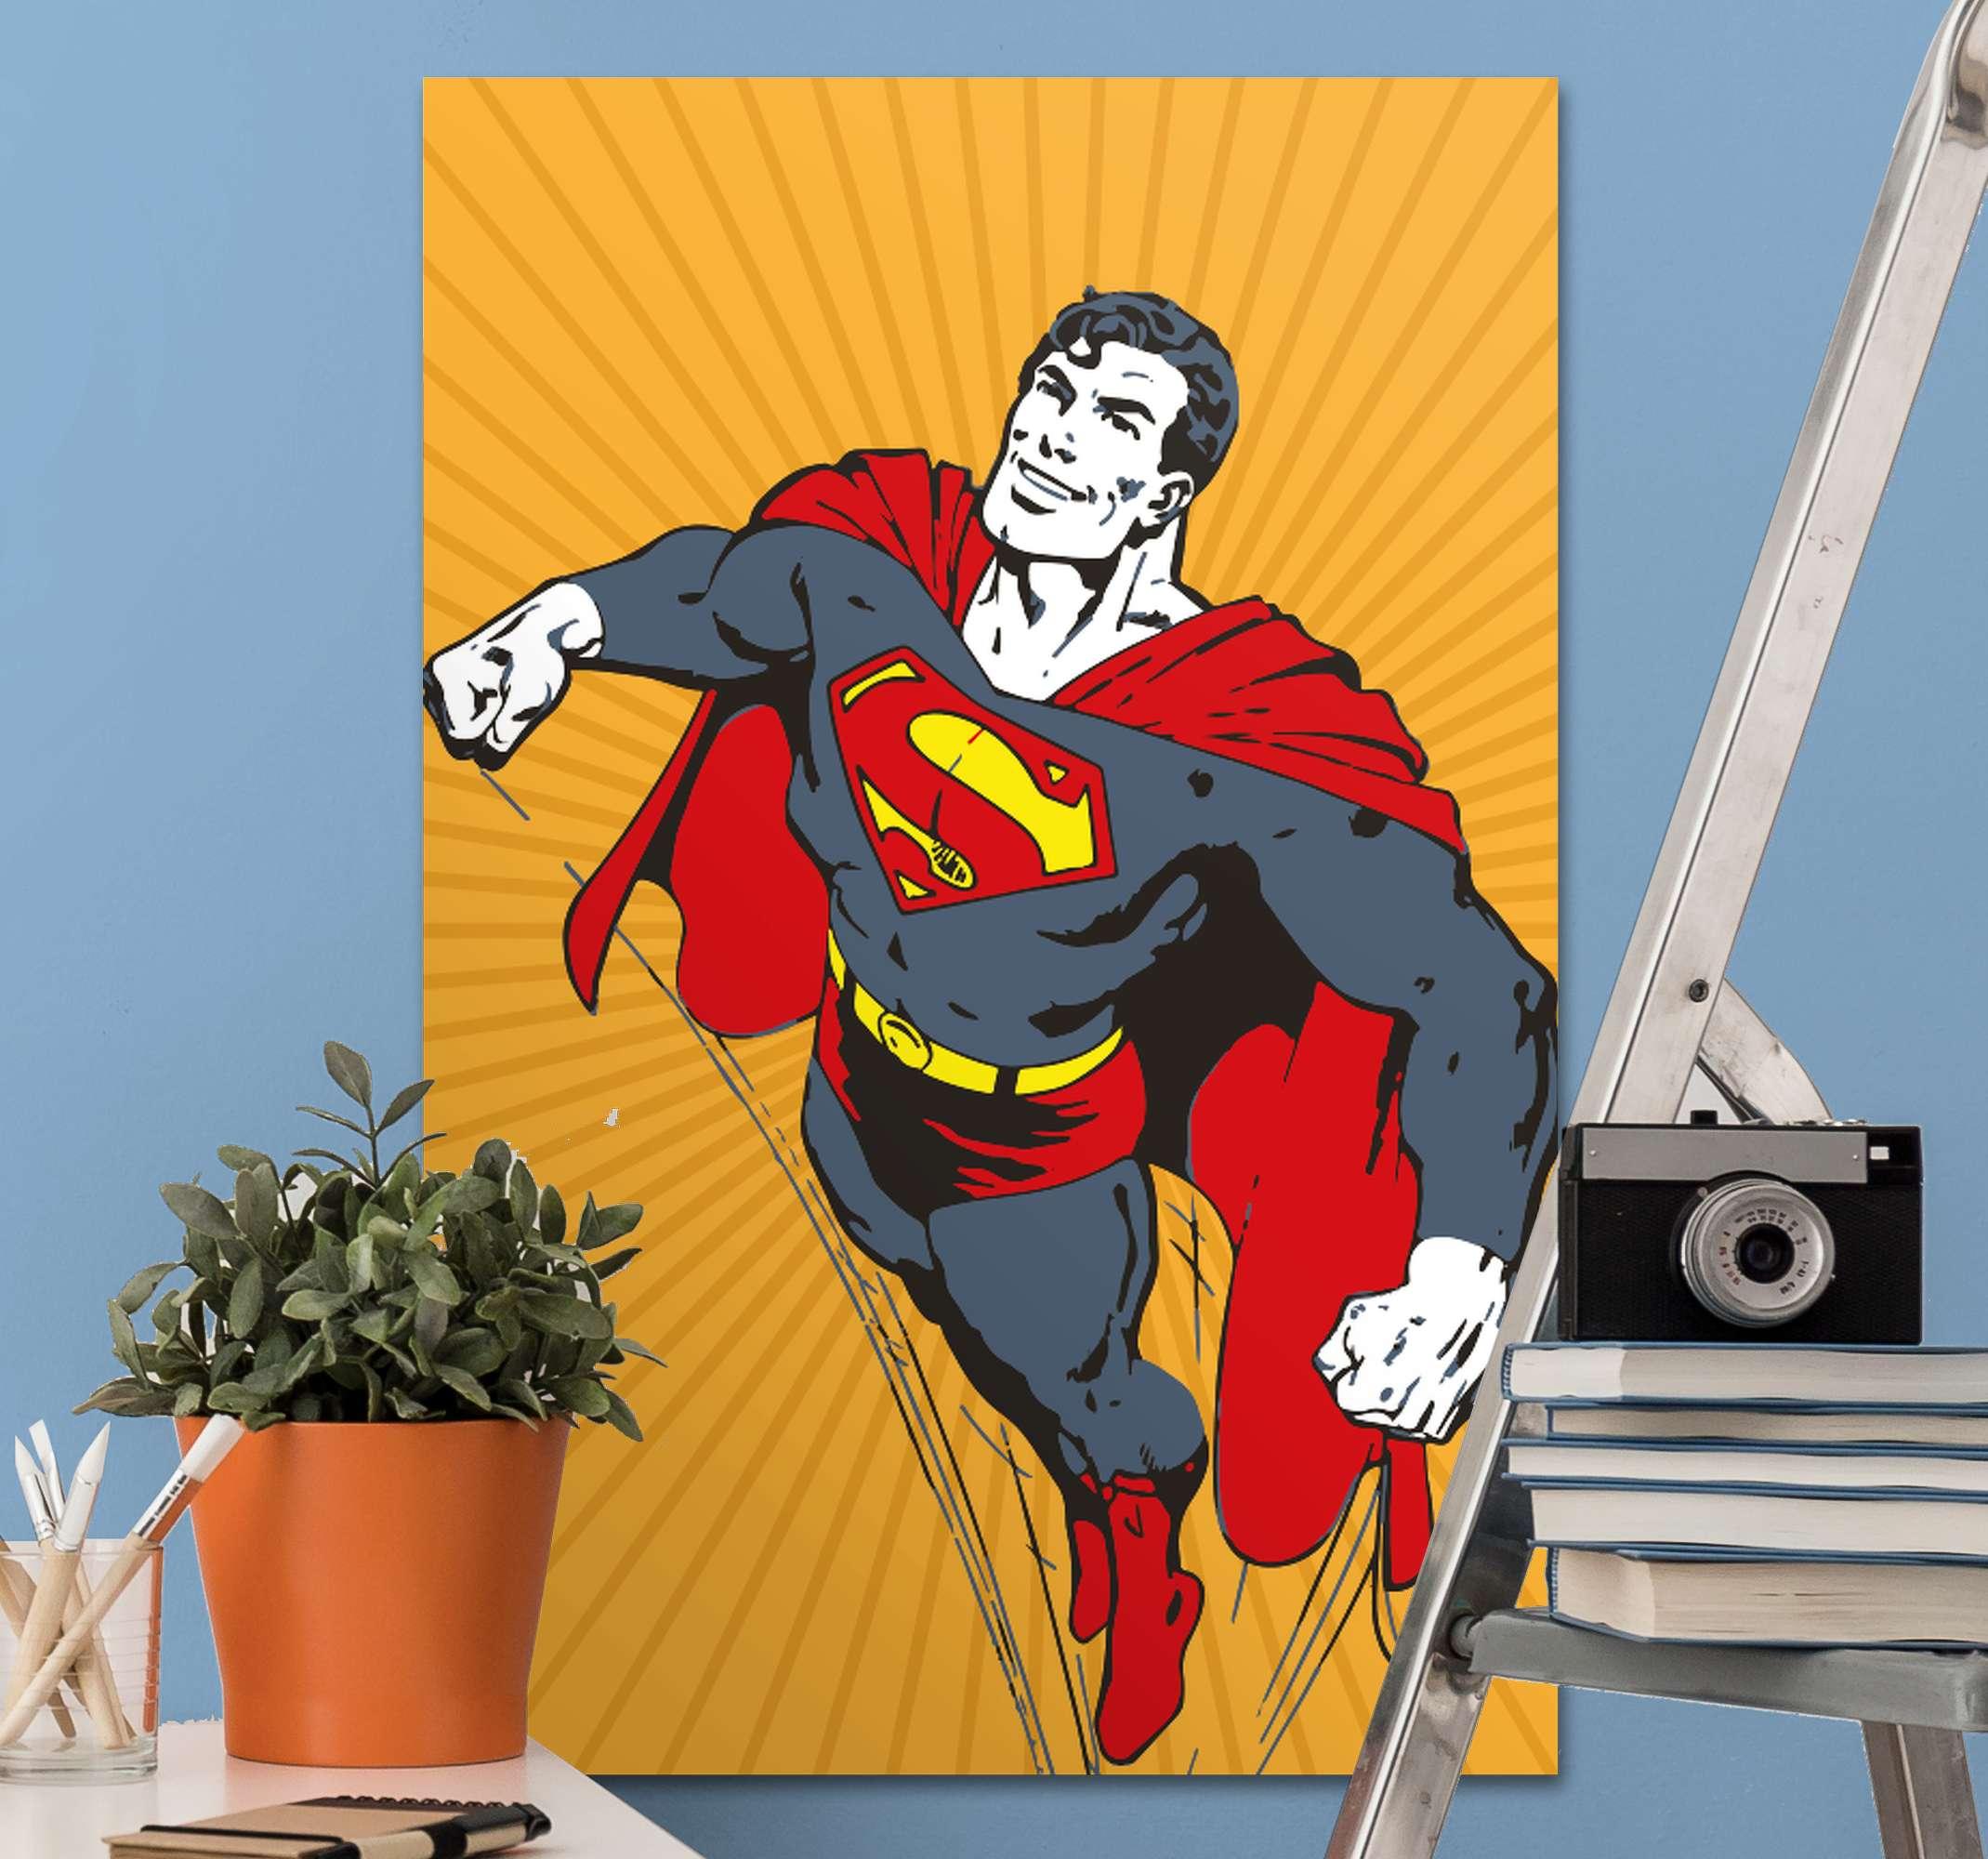 TenStickers. 슈퍼맨 슈퍼 히어로 액자 벽 예술. 슈퍼맨과 캔버스 인쇄. 노란색 복고풍 배경에 슈퍼 히어로를 제공합니다. 쉽게 걸 수 있습니다. 고품질 소재로 제작되었습니다.